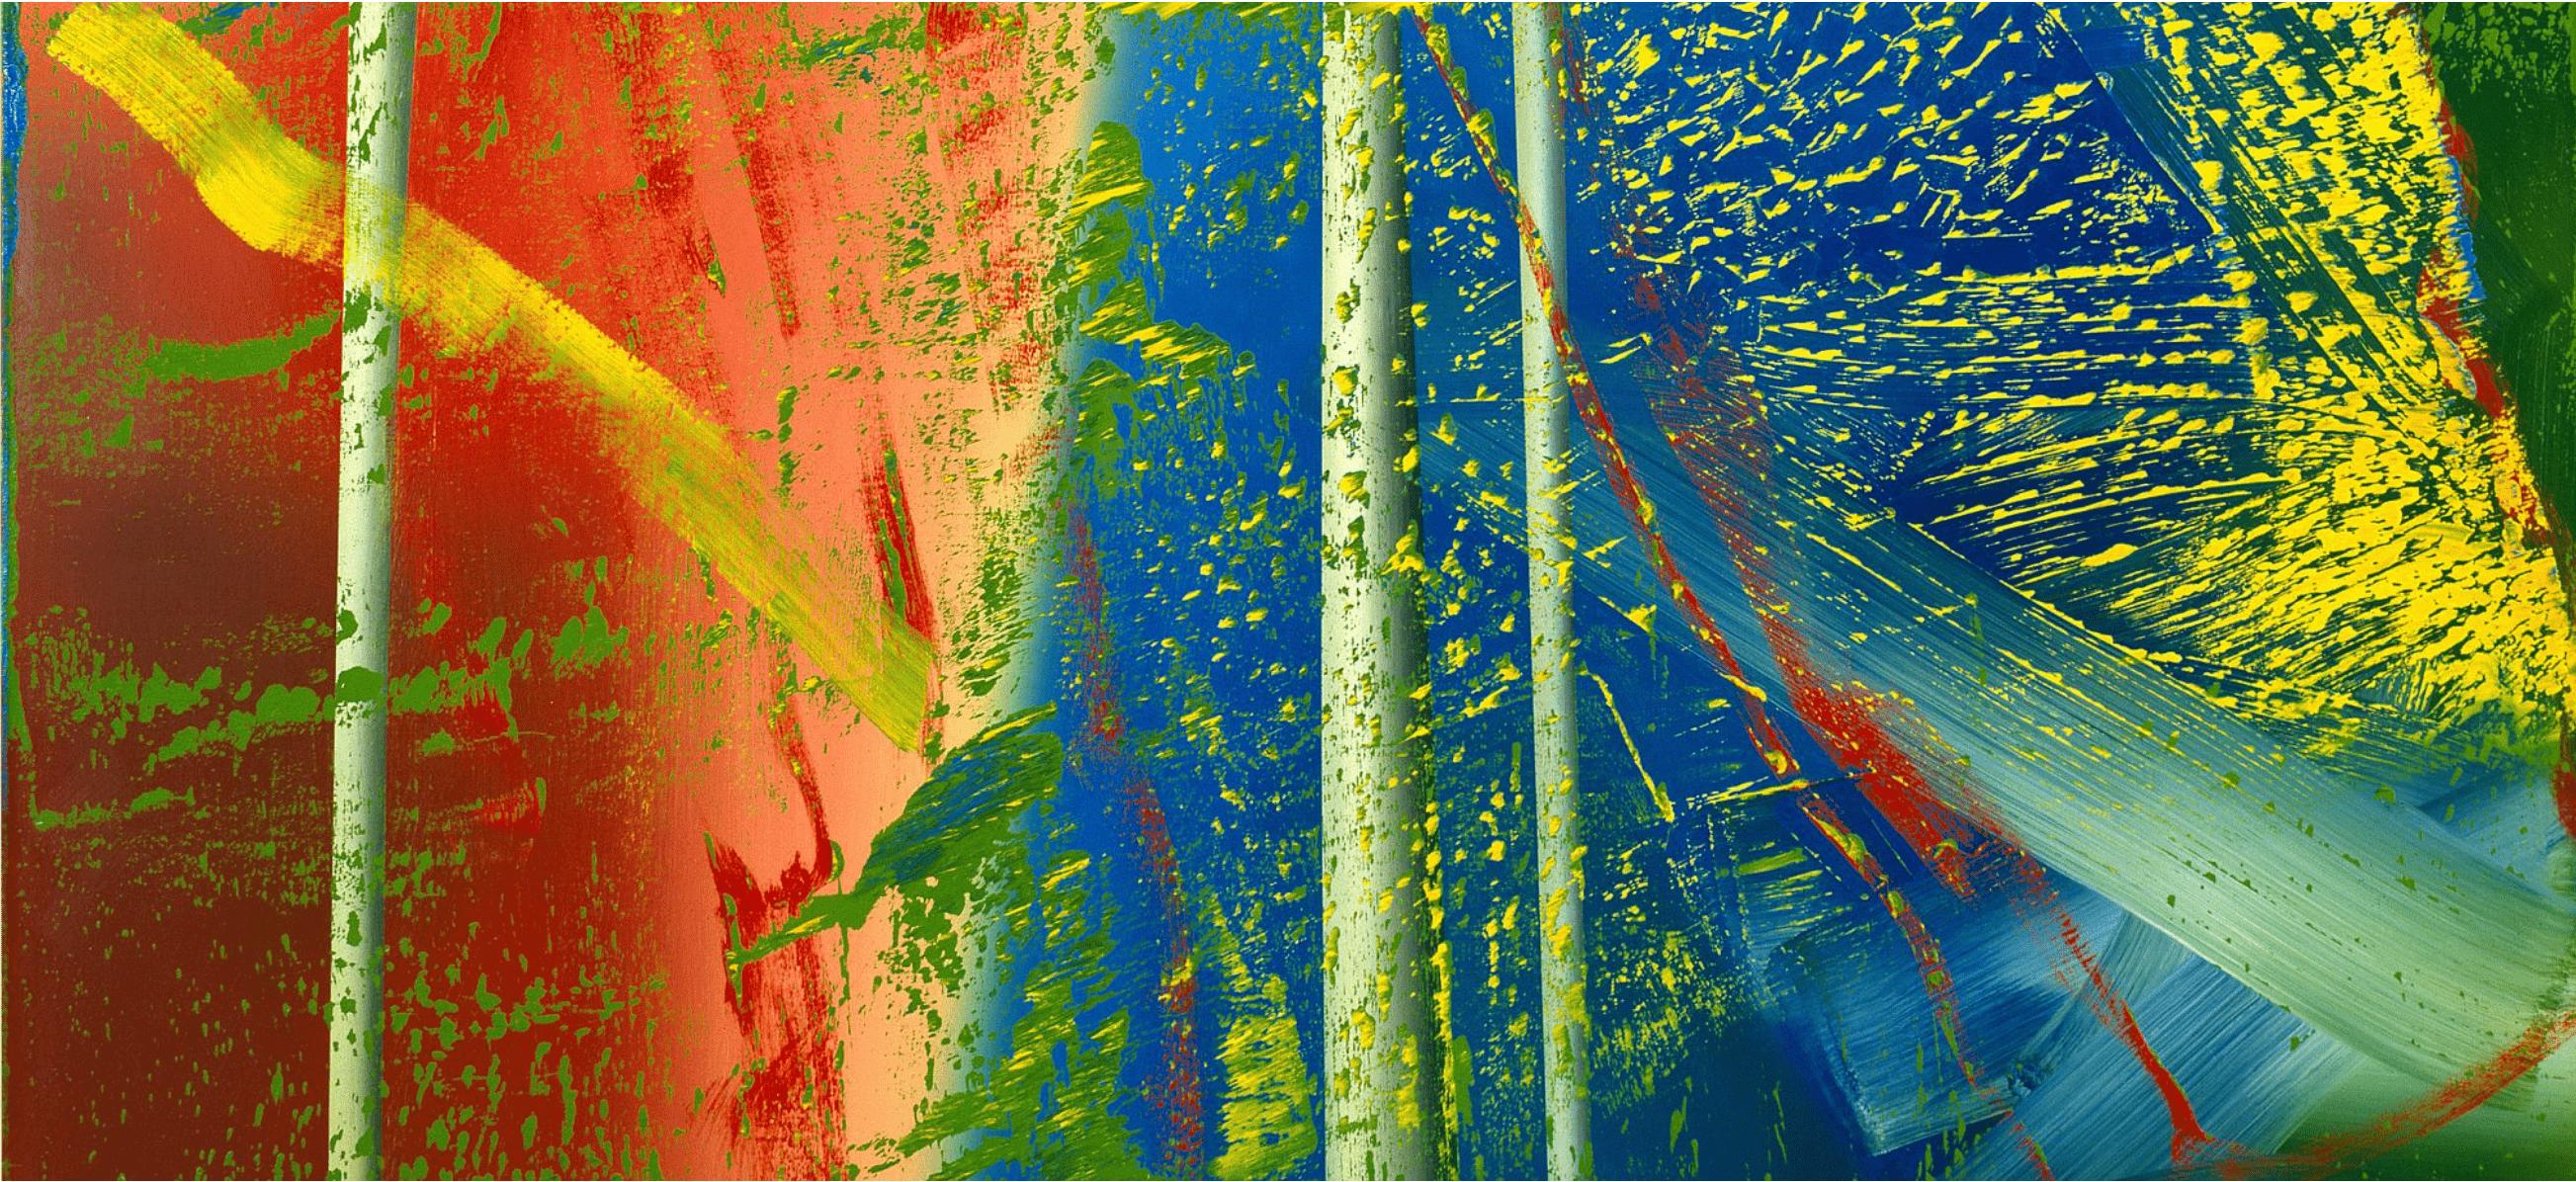 Gerhard Richter: Abstraktes Bilder